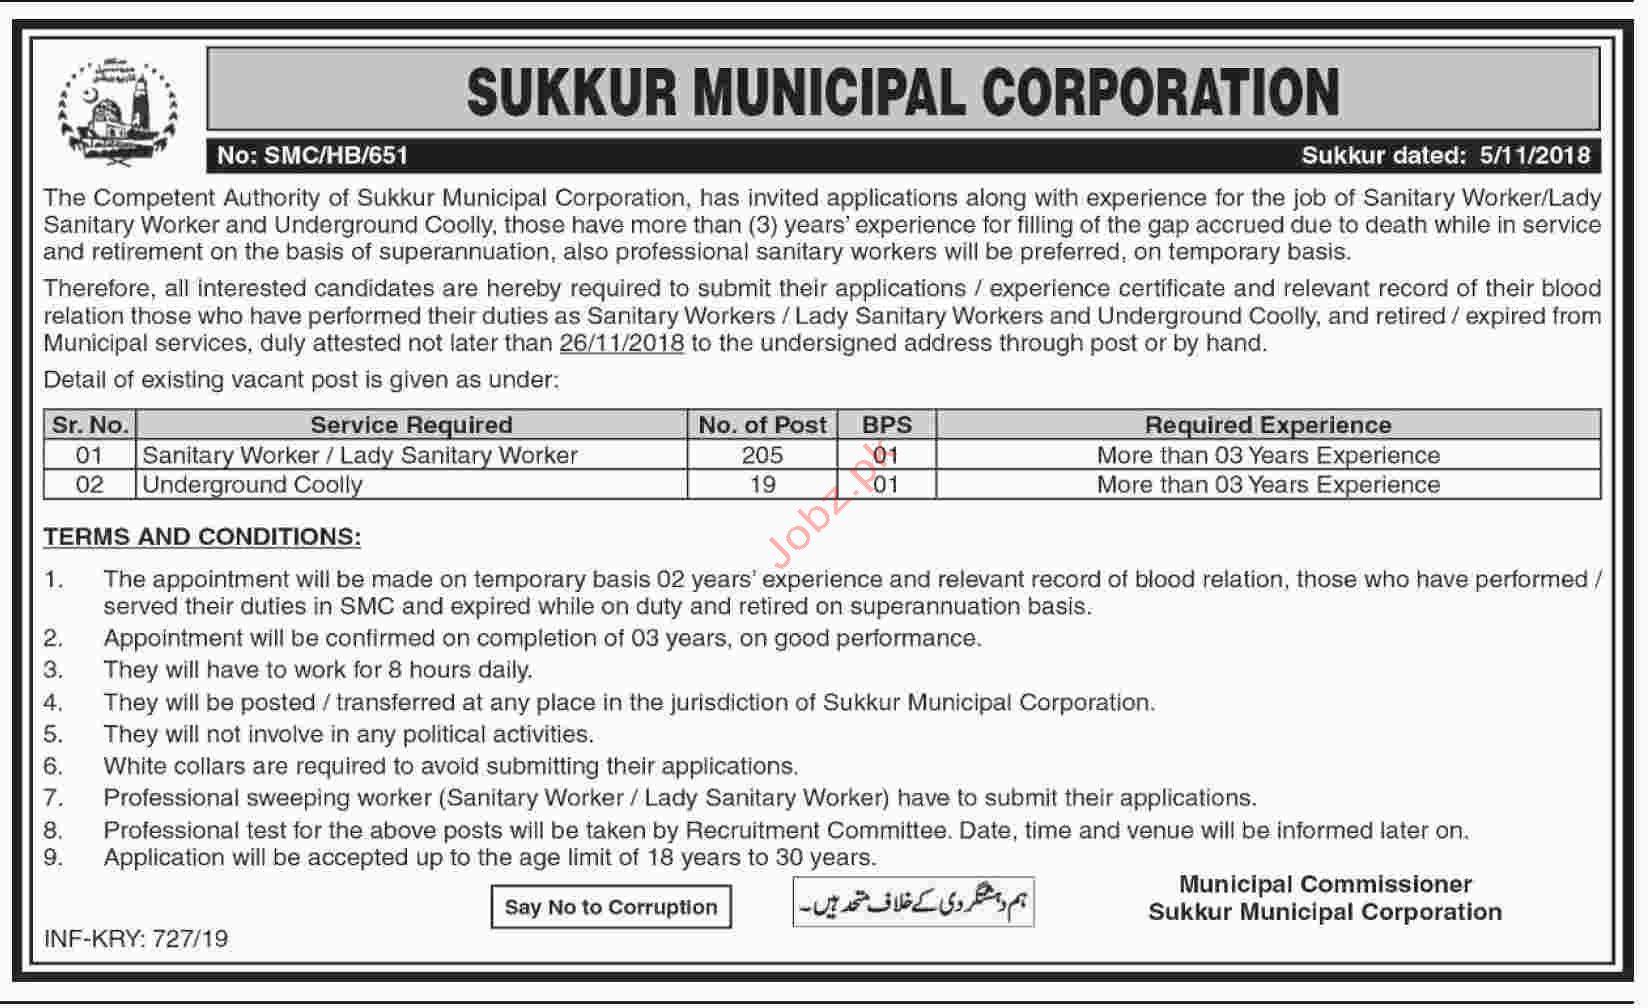 Sukkur Municipal Corporation Sanitary Worker Jobs 2019